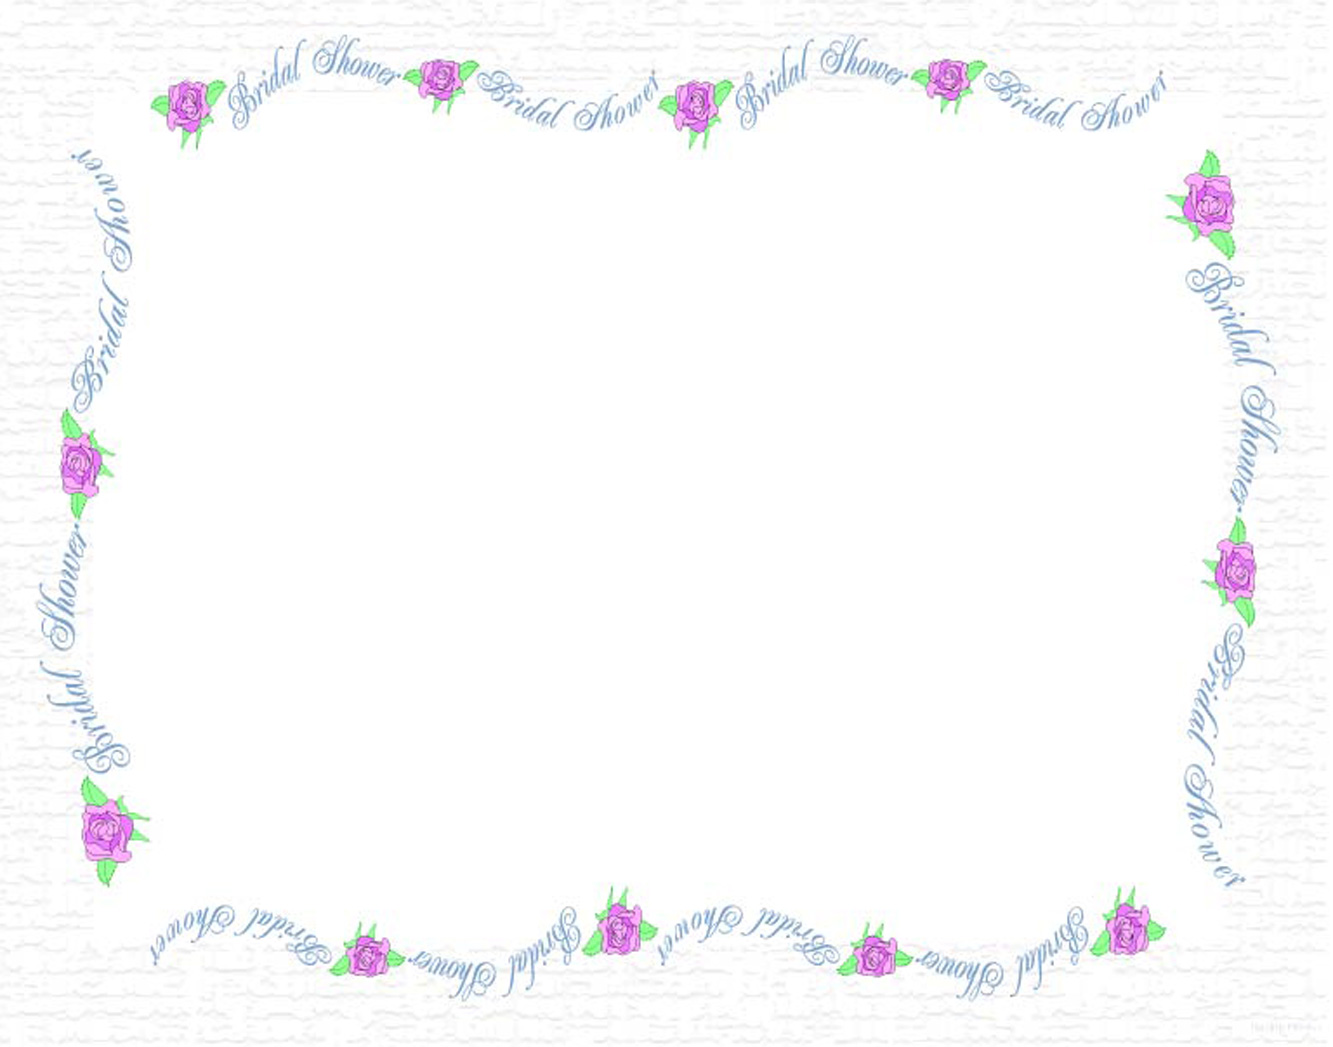 free wedding shower clip art borders - photo #4